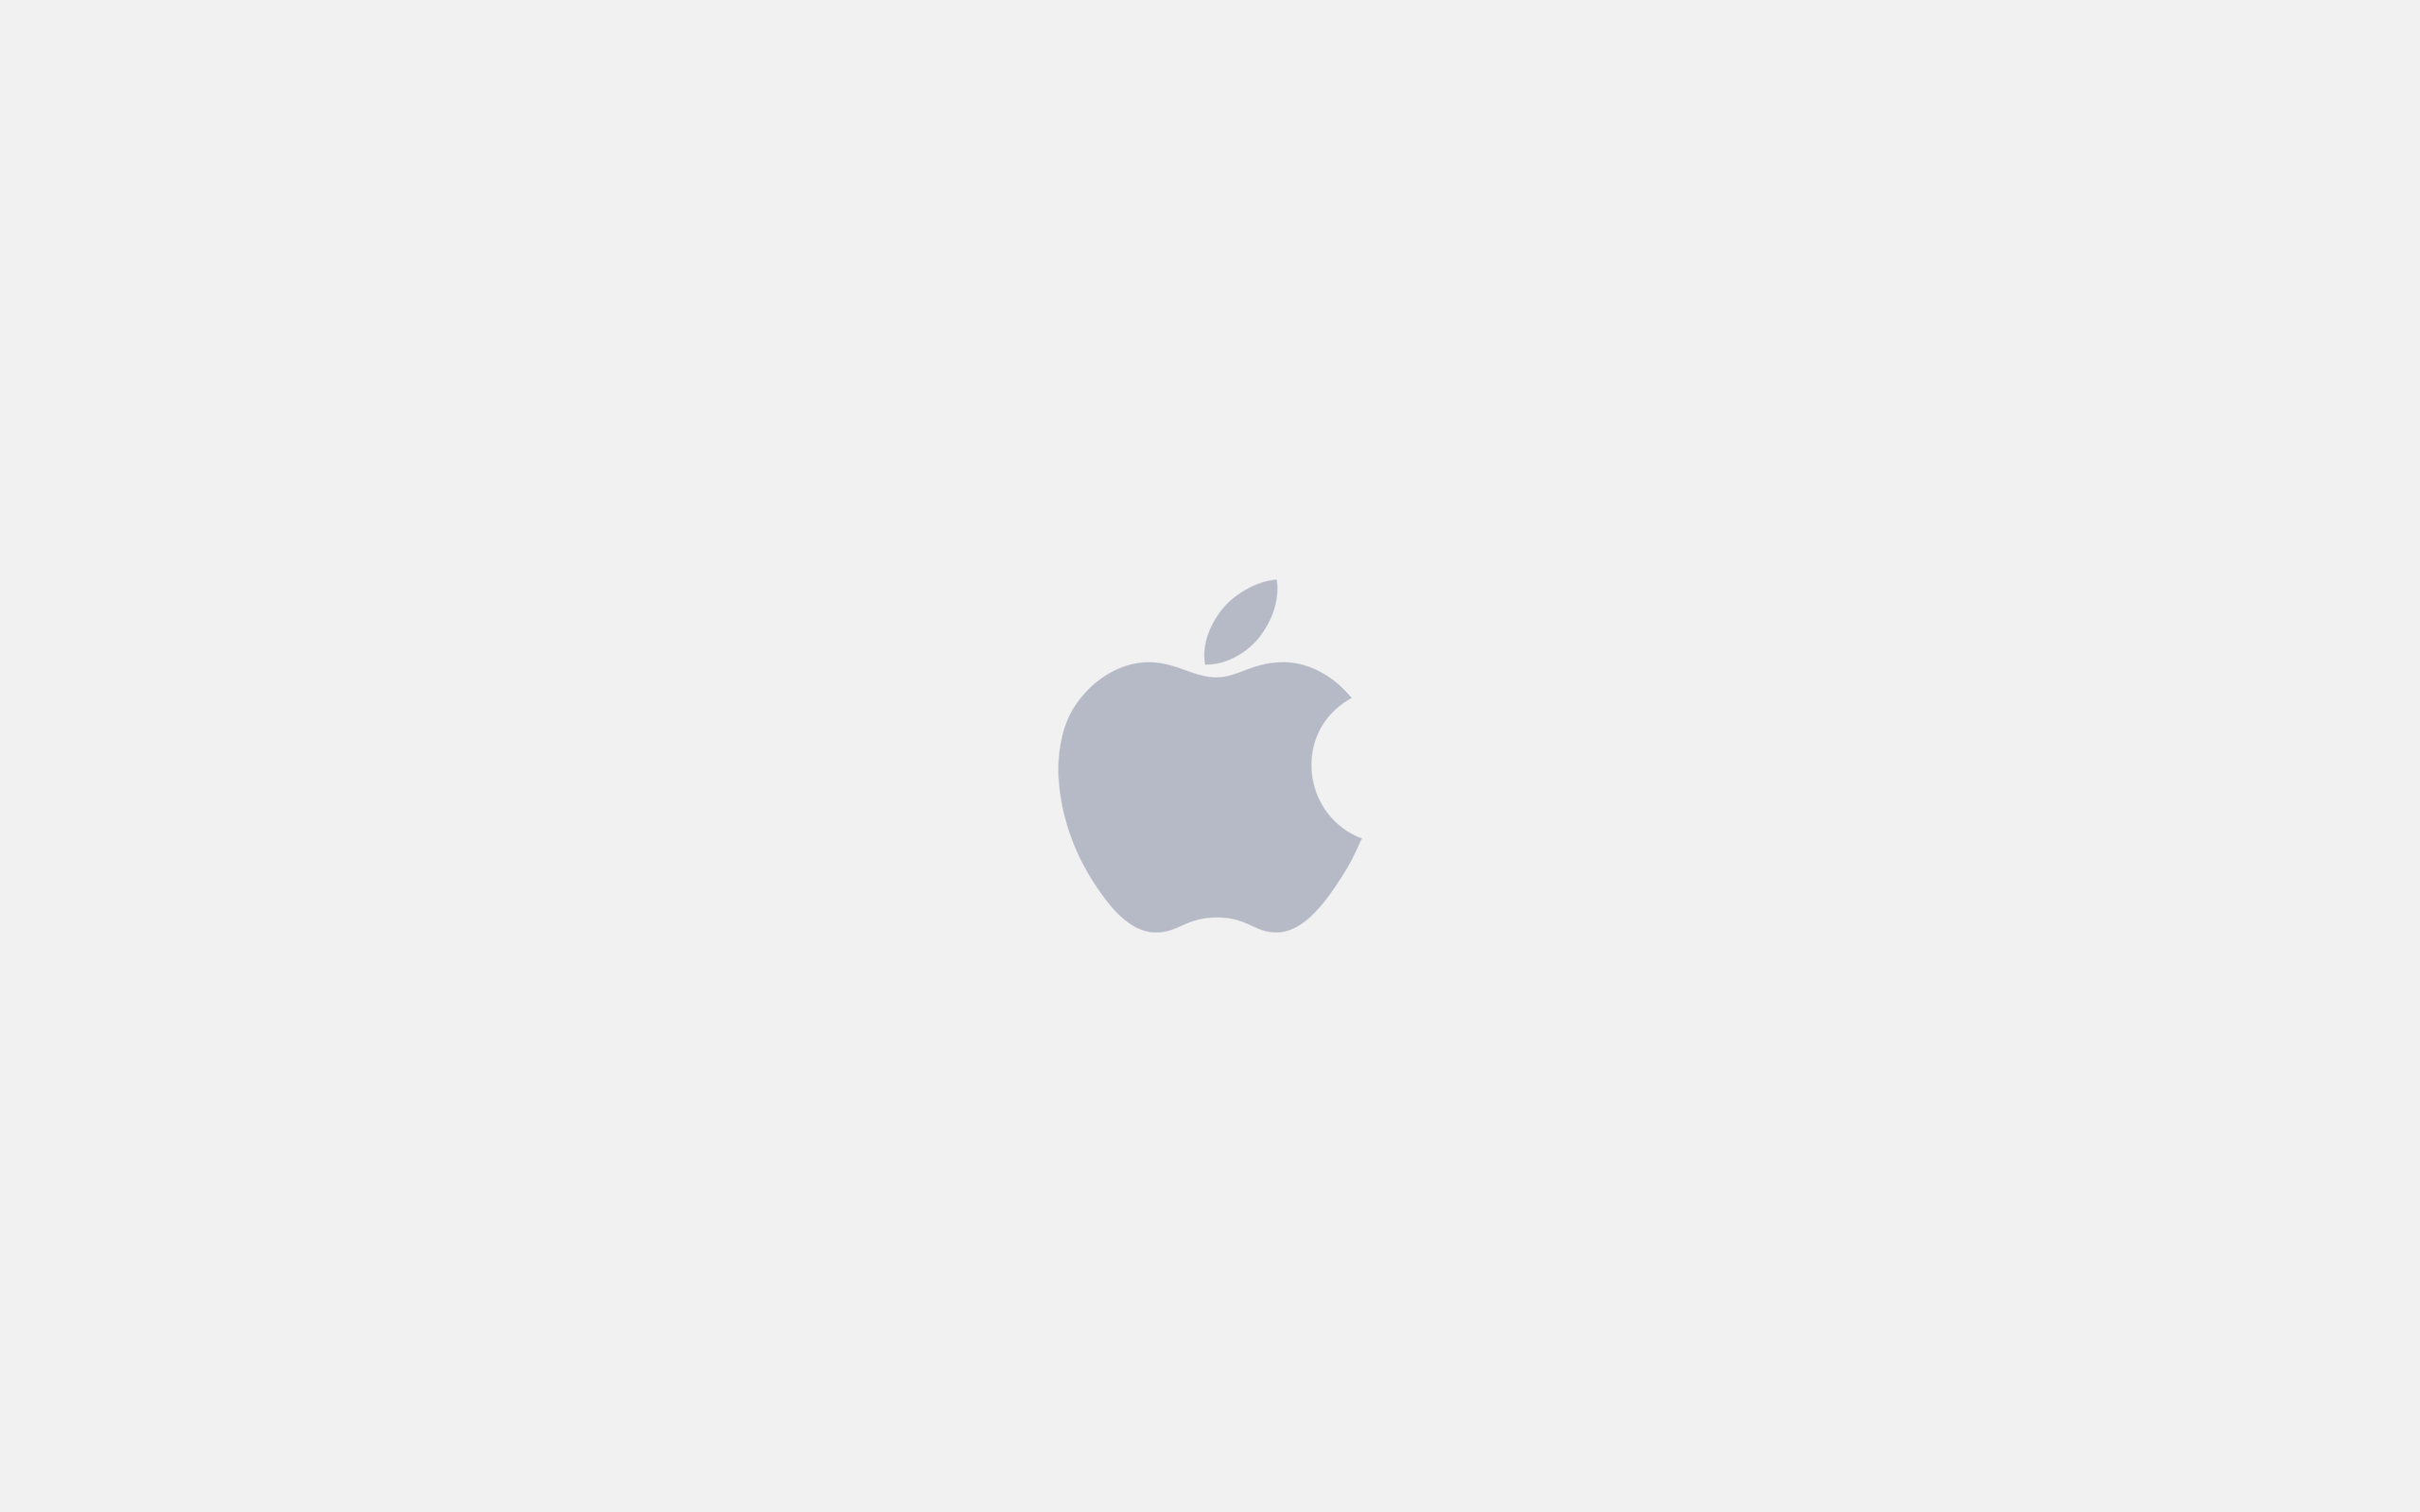 White Apple Logo Wallpapers - Top Free White Apple Logo